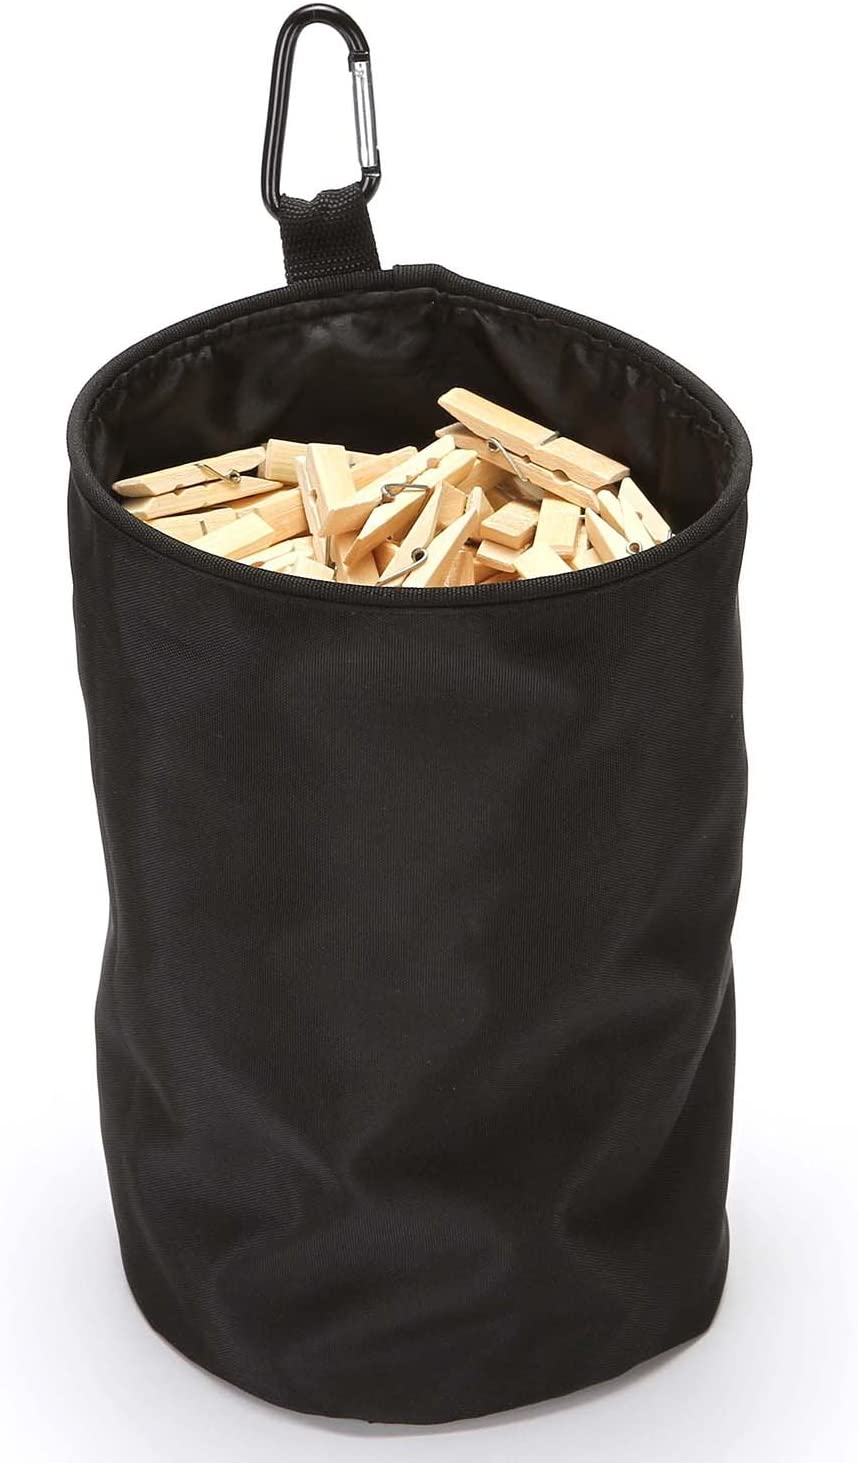 VEAMOR Clothespin Bag Hanging Clothesline Peg Organizer Storage Bags,Dust-Proof (Black)